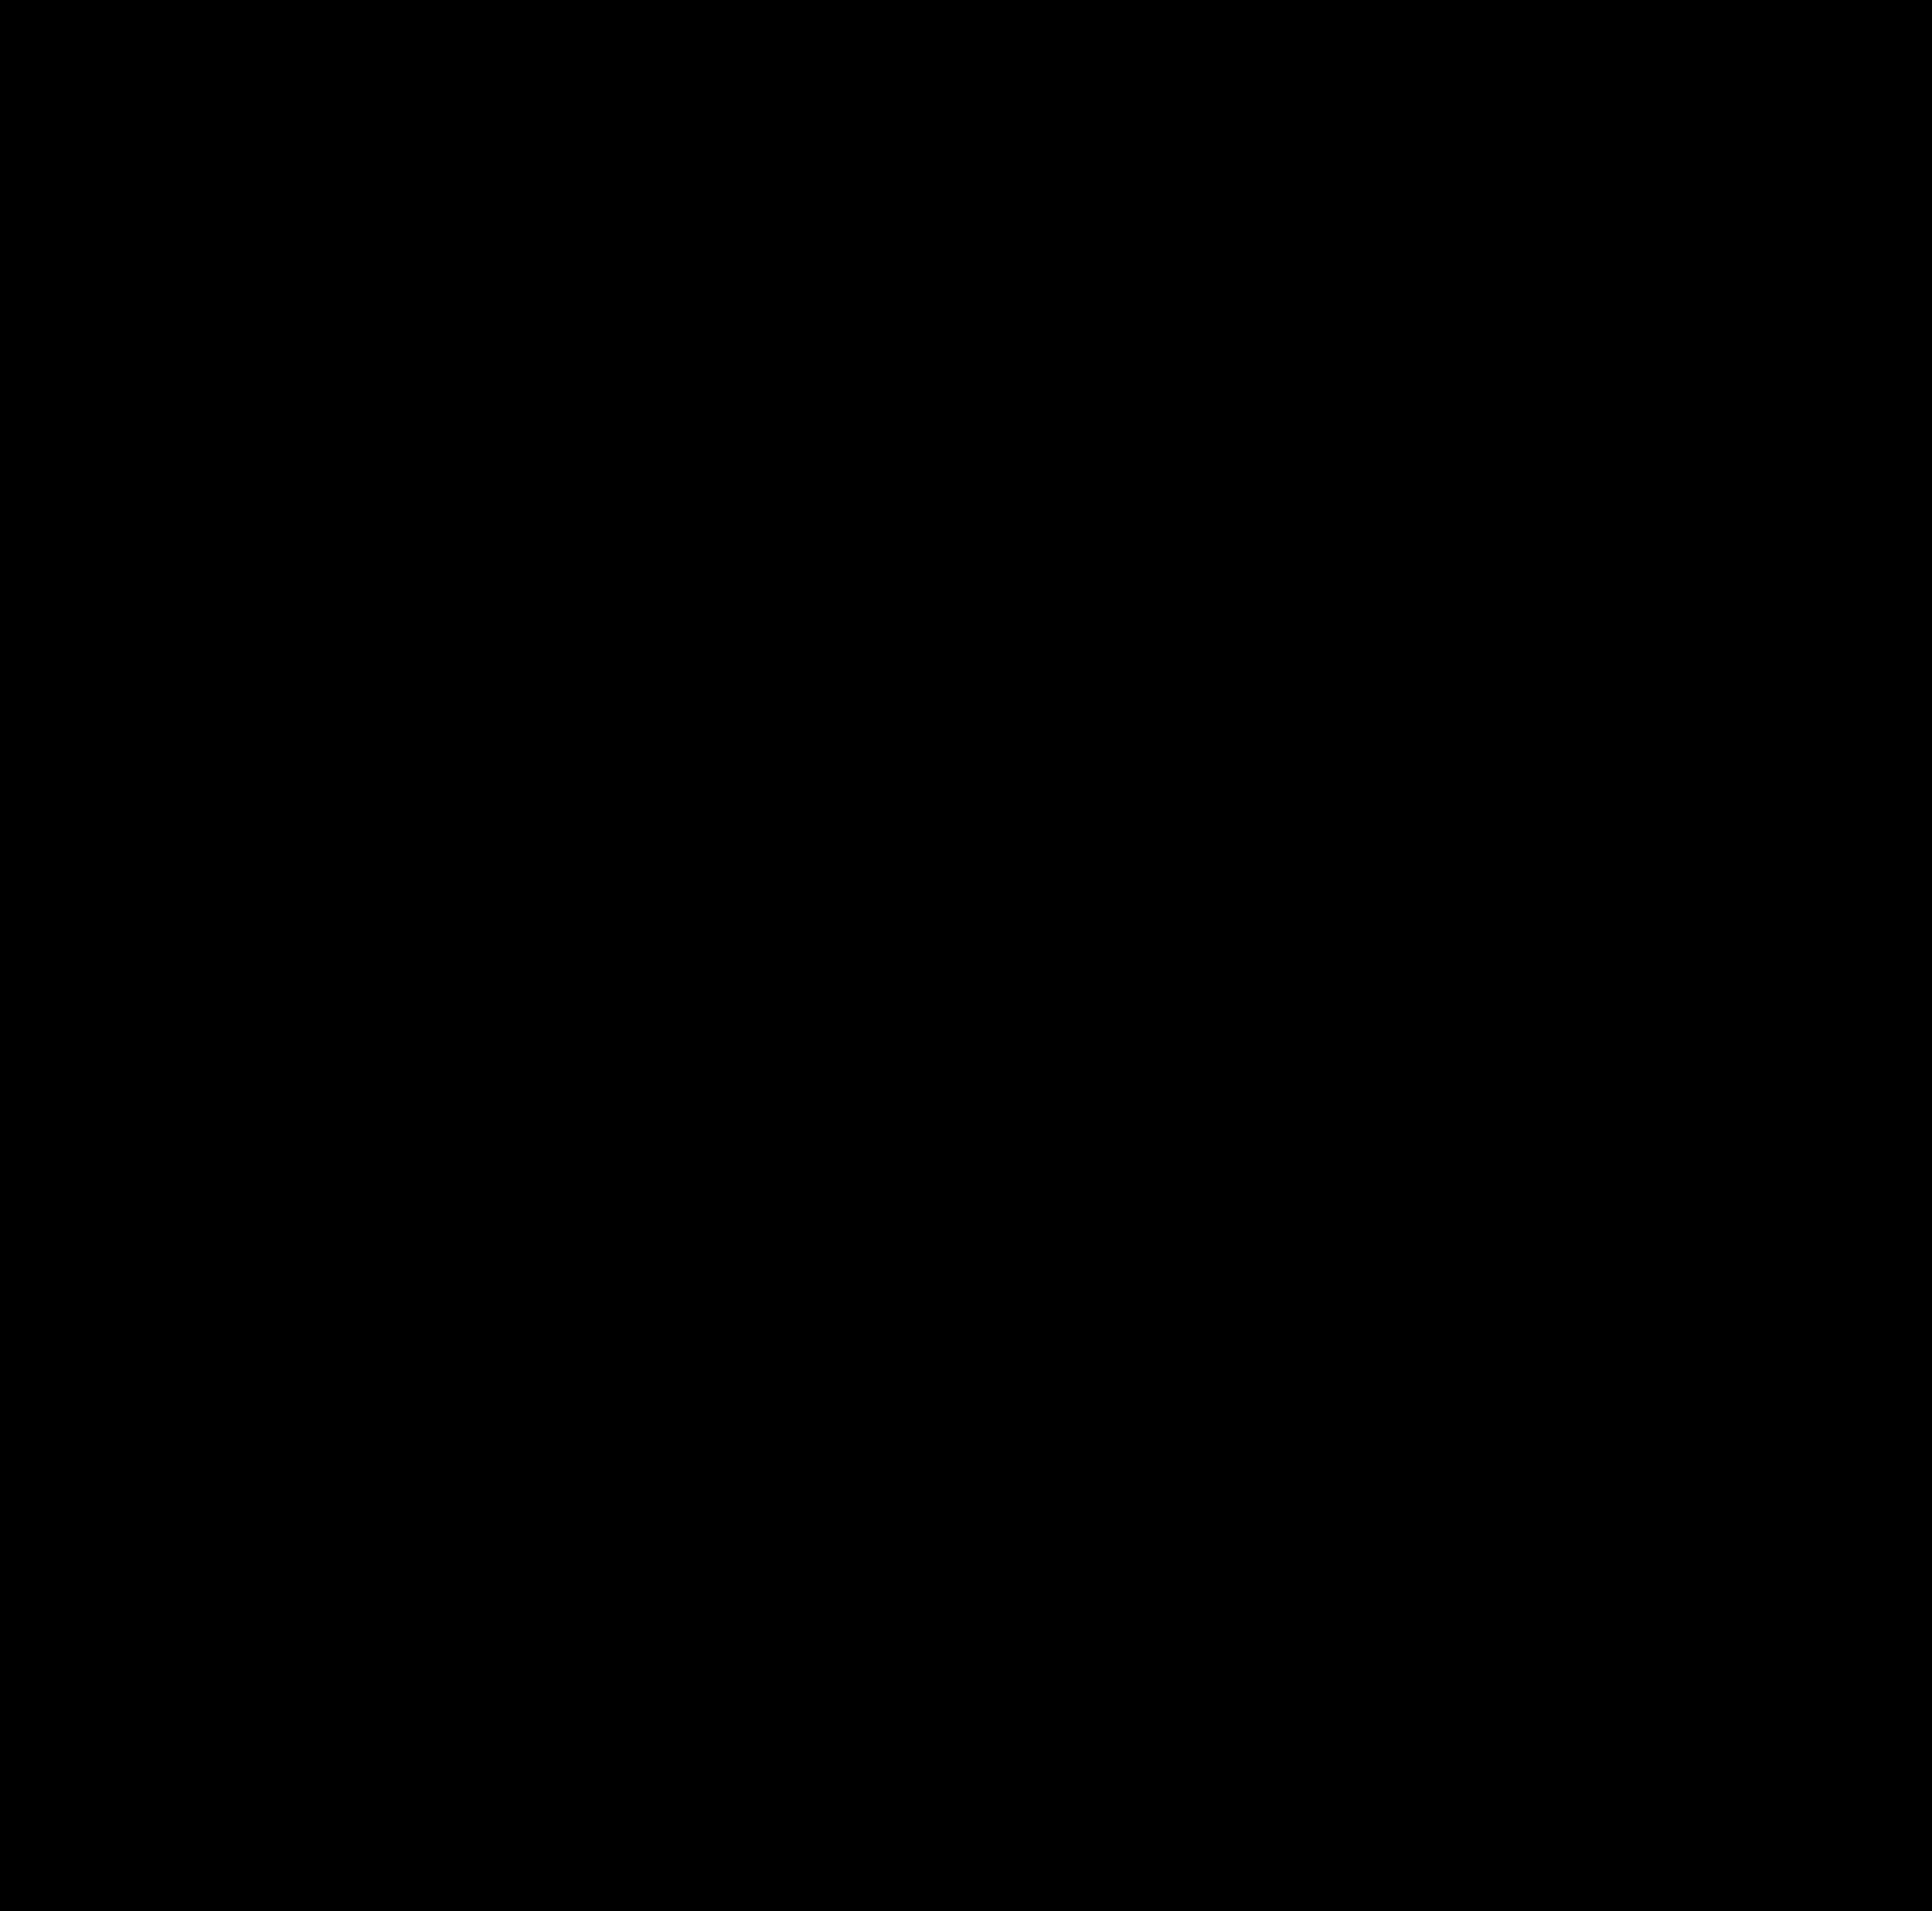 videt-oculu